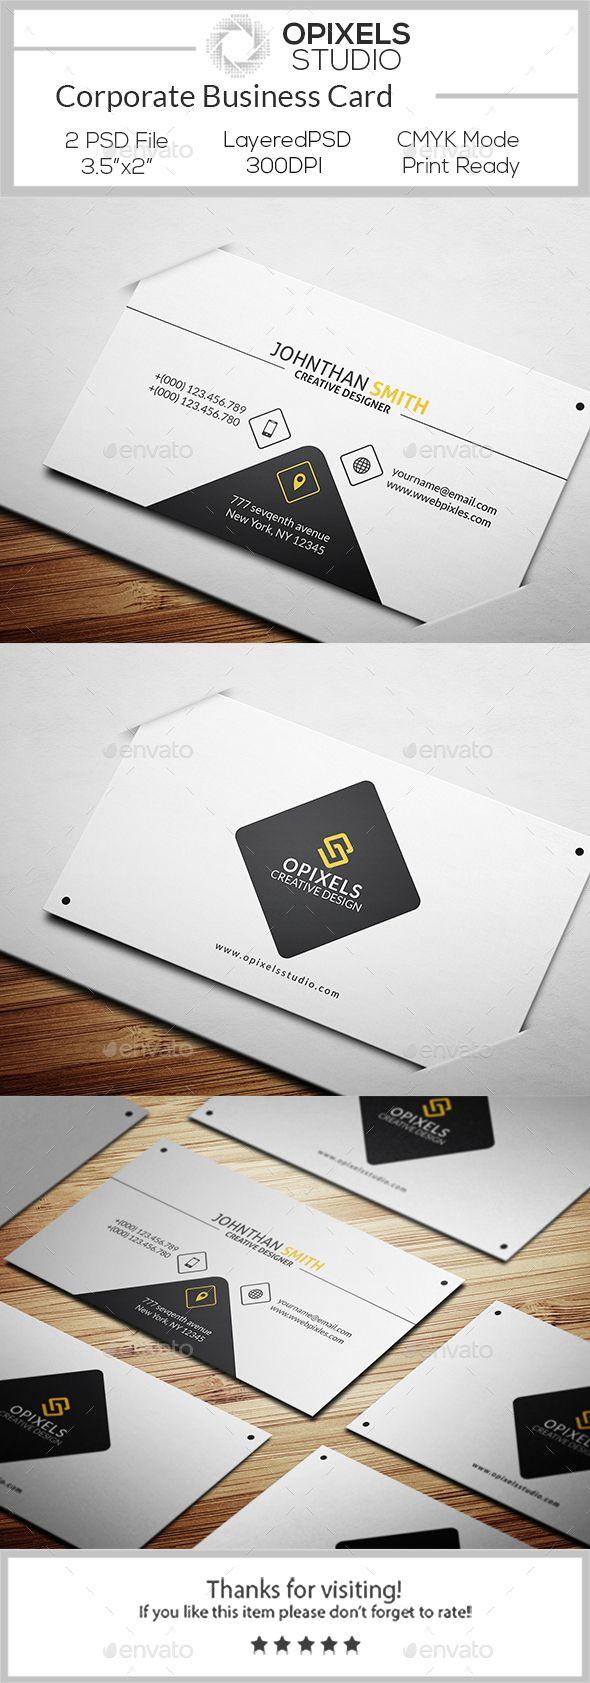 Corporate Business Card Template PSD